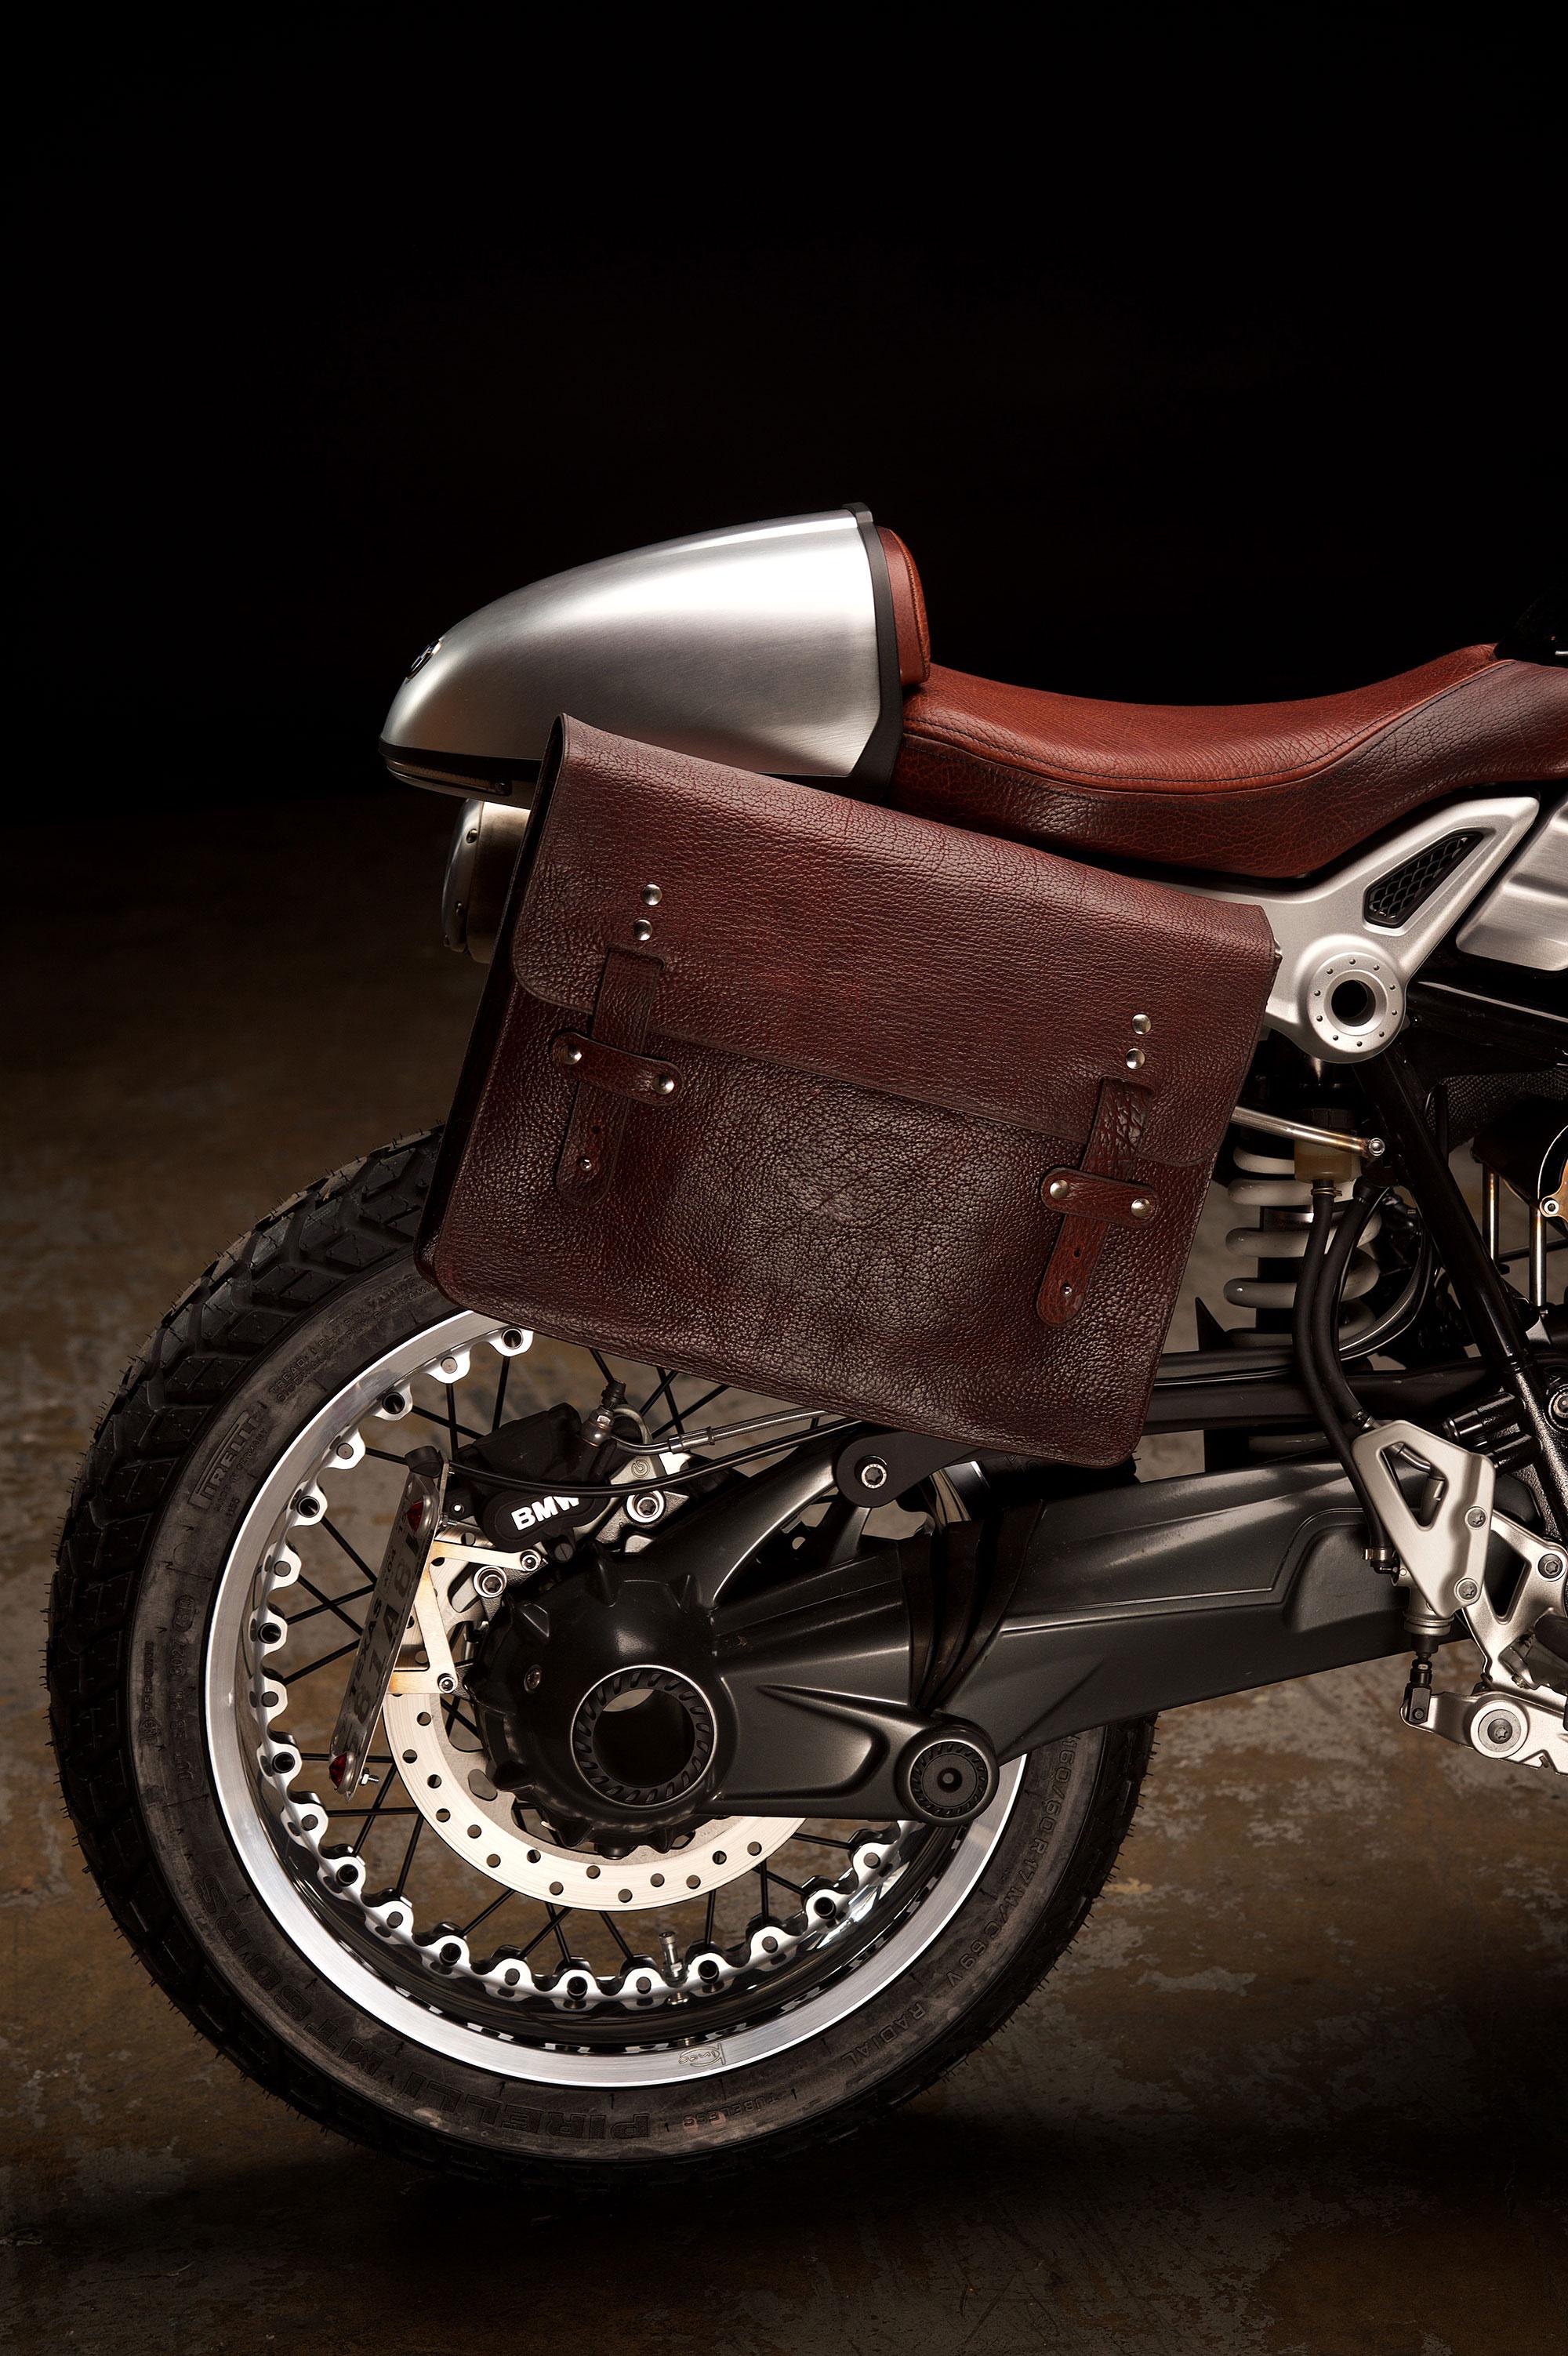 Revival-Cycles-Custom-Build-2014-BMW-RNineT-v2-067-2000w.jpg